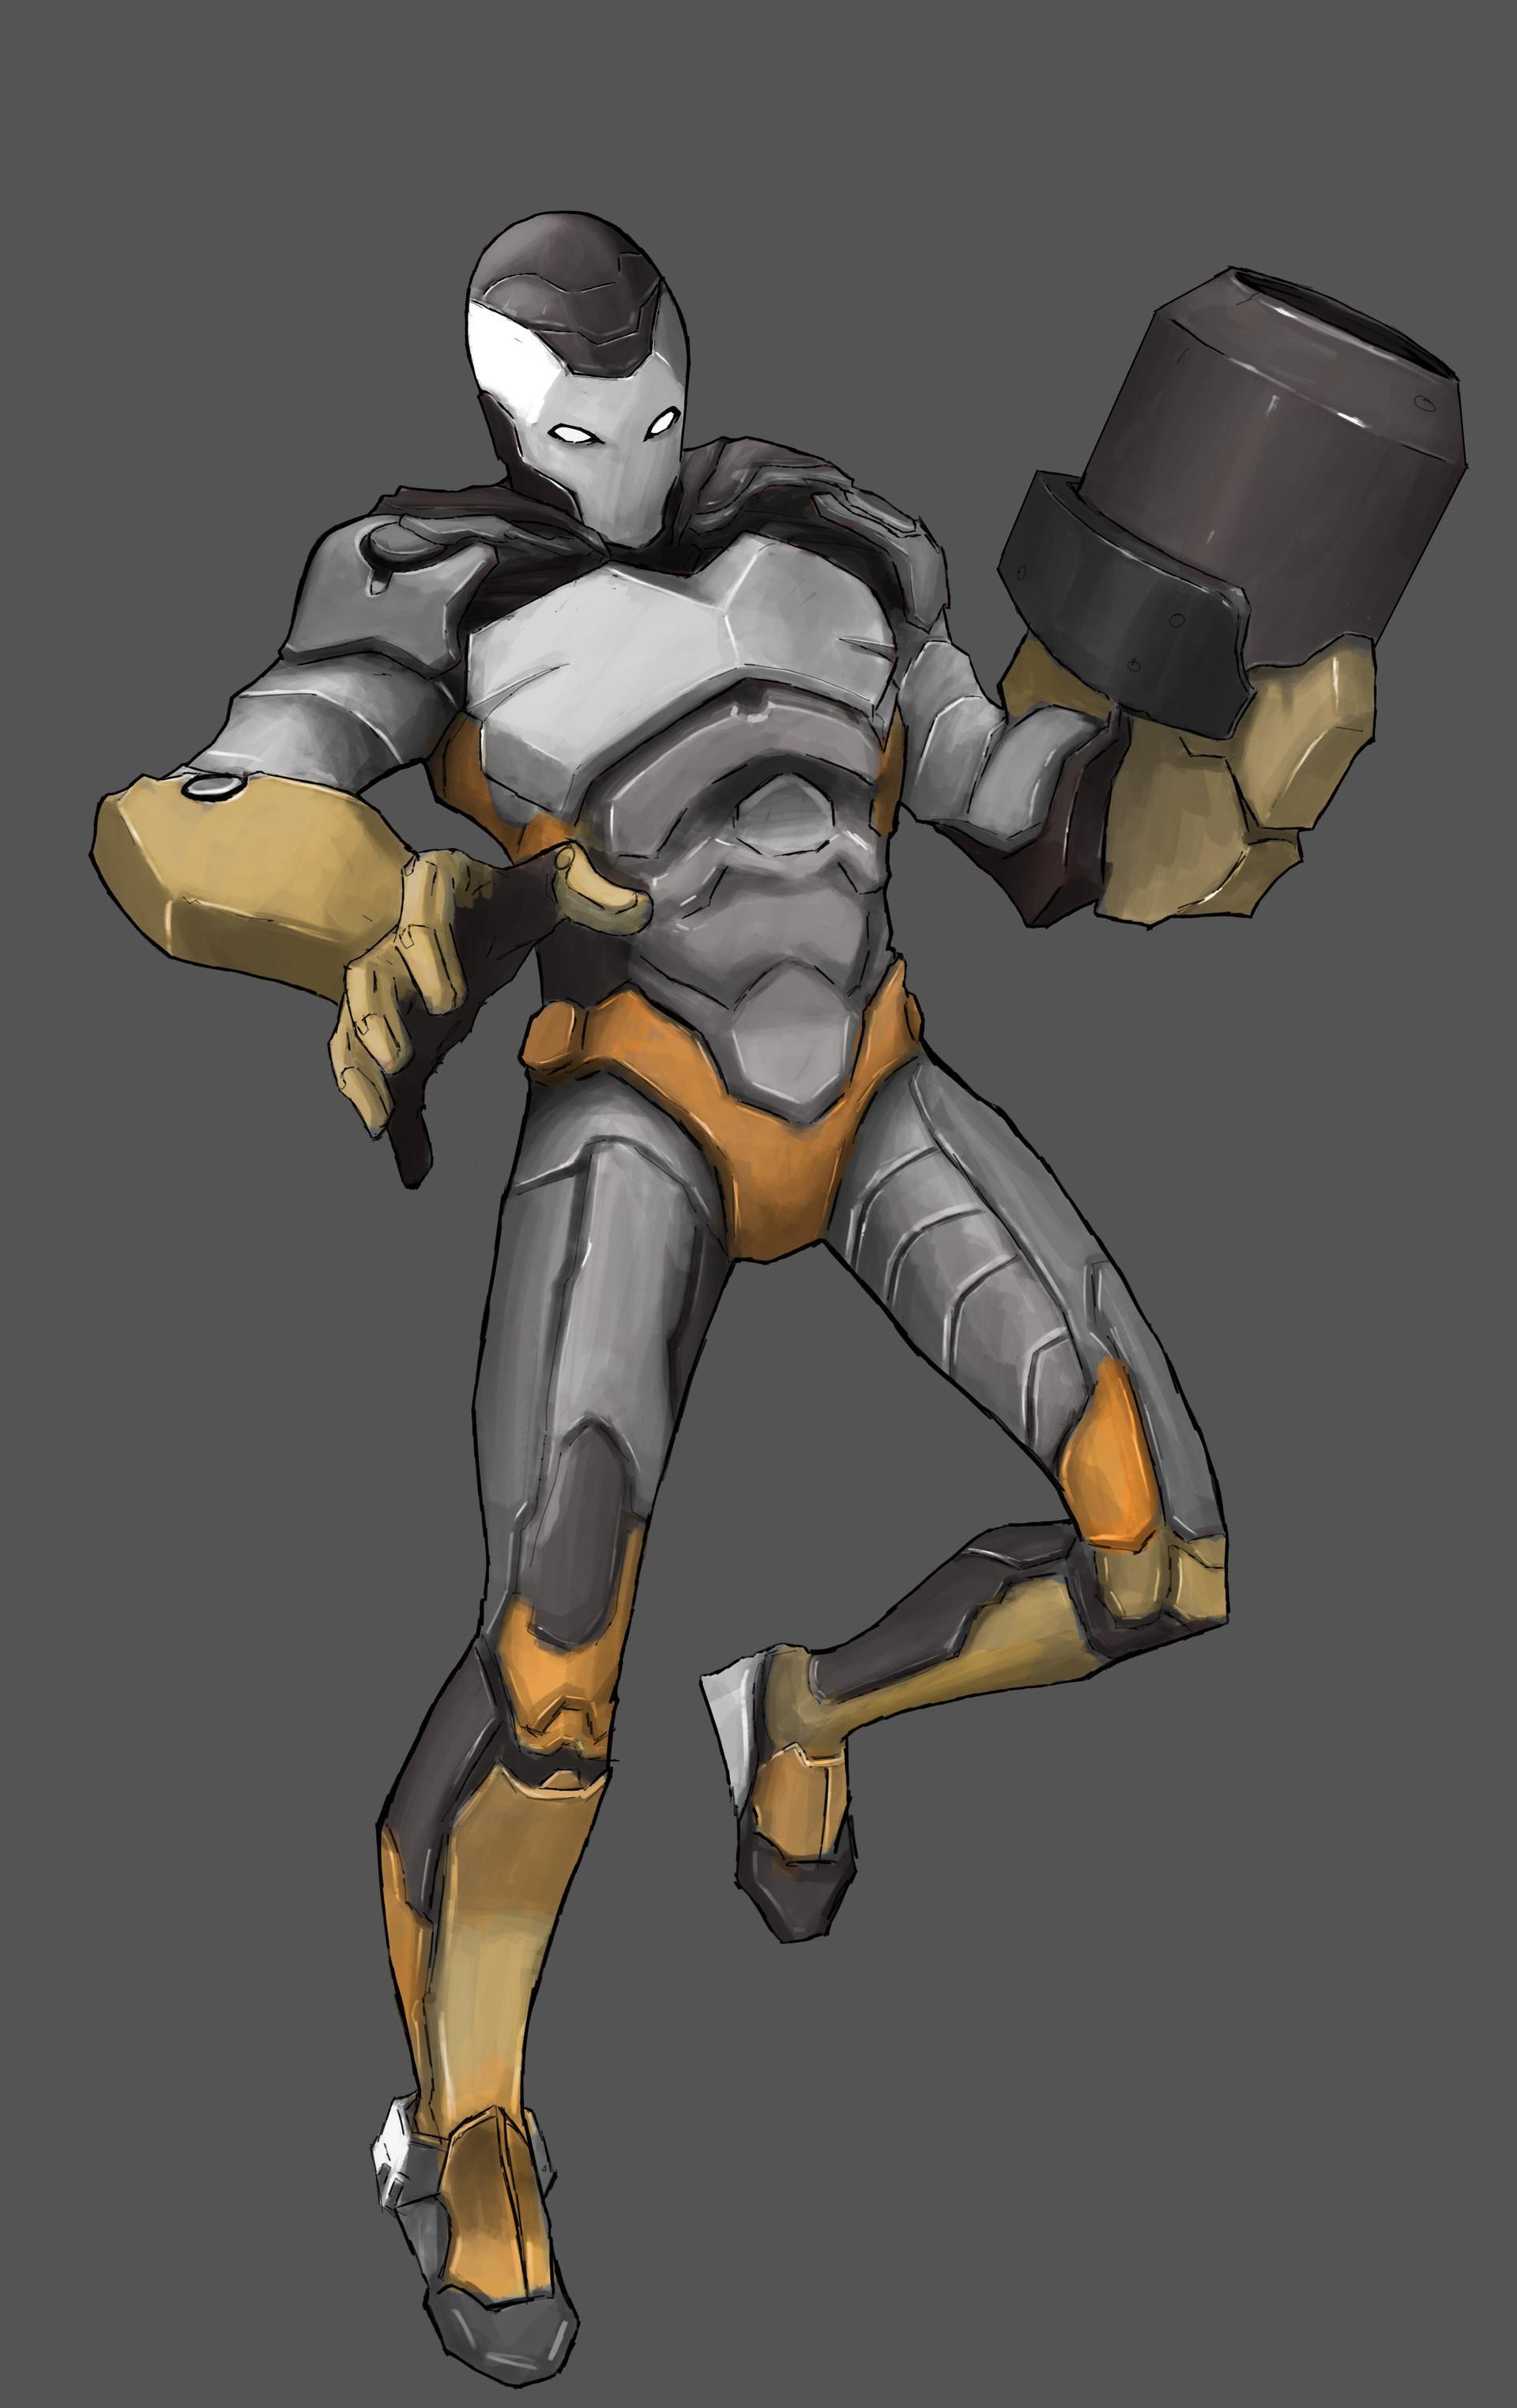 Gbenle maverick cyborg 8